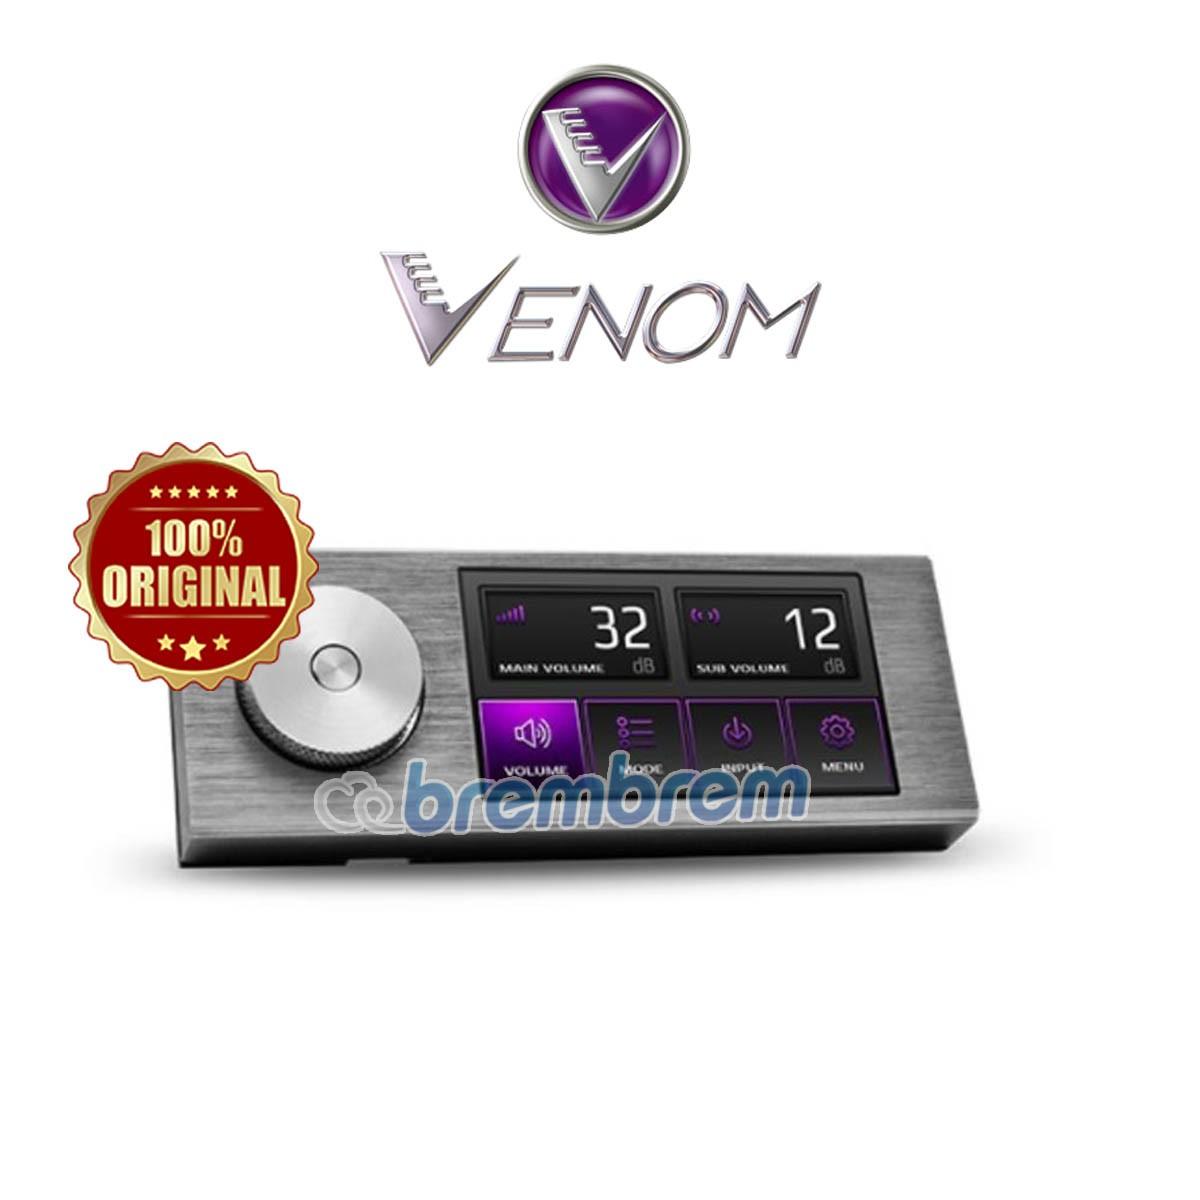 VENOM PANDORA VPR CT 1 - CONTROL BASIC